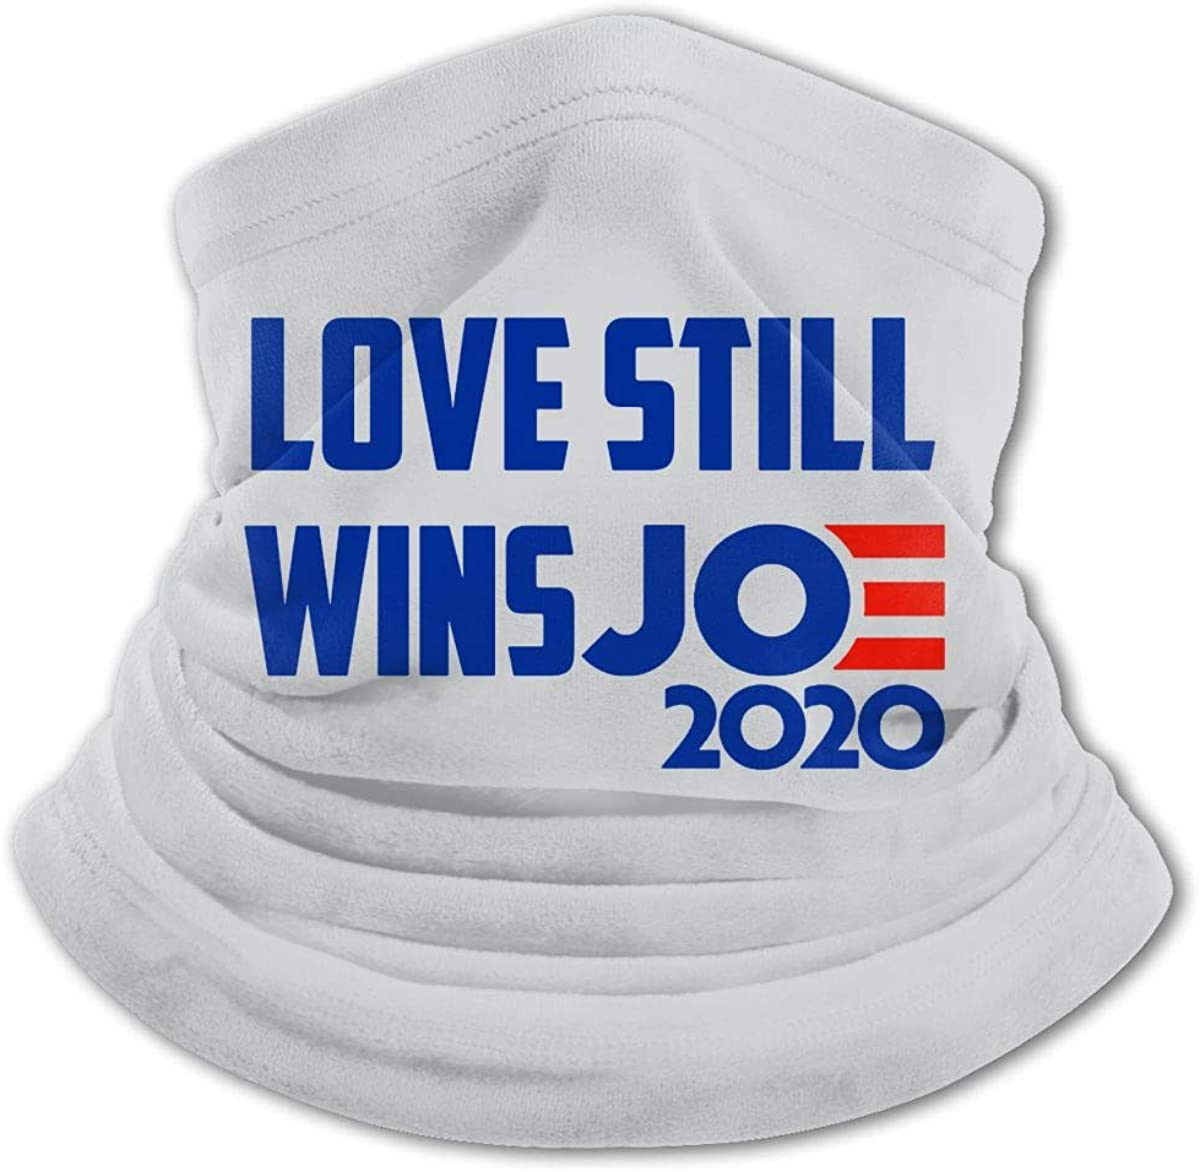 Love Still Wins Joe 2020 Youth Face Mask Bandanas Neck Gaiter Headband Boy Girl Scarf Balaclava For Cycling Hiking Outdoor